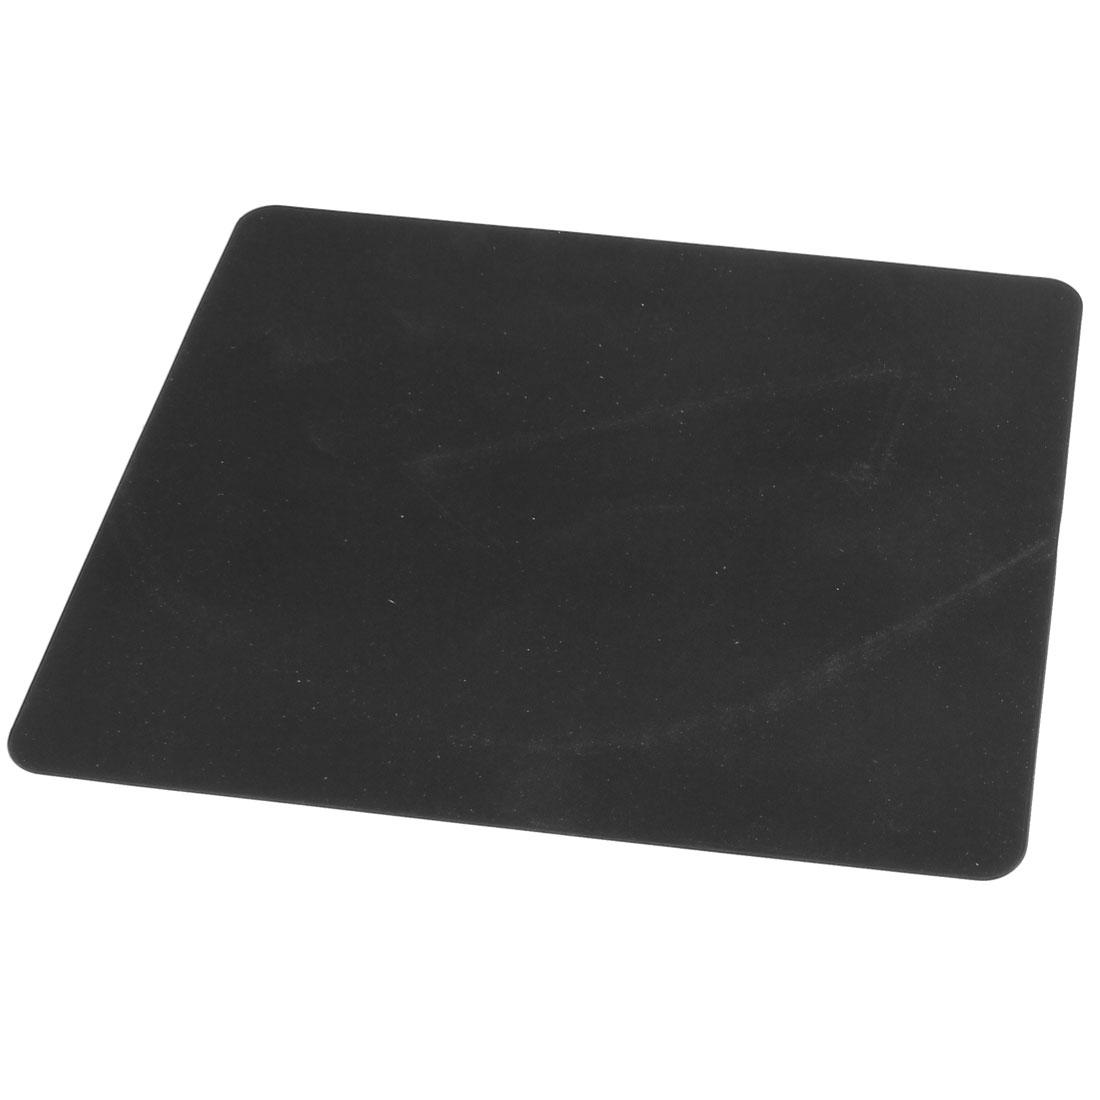 Black Nonslip Silicone Desktop Computer Mouse Pad Mat